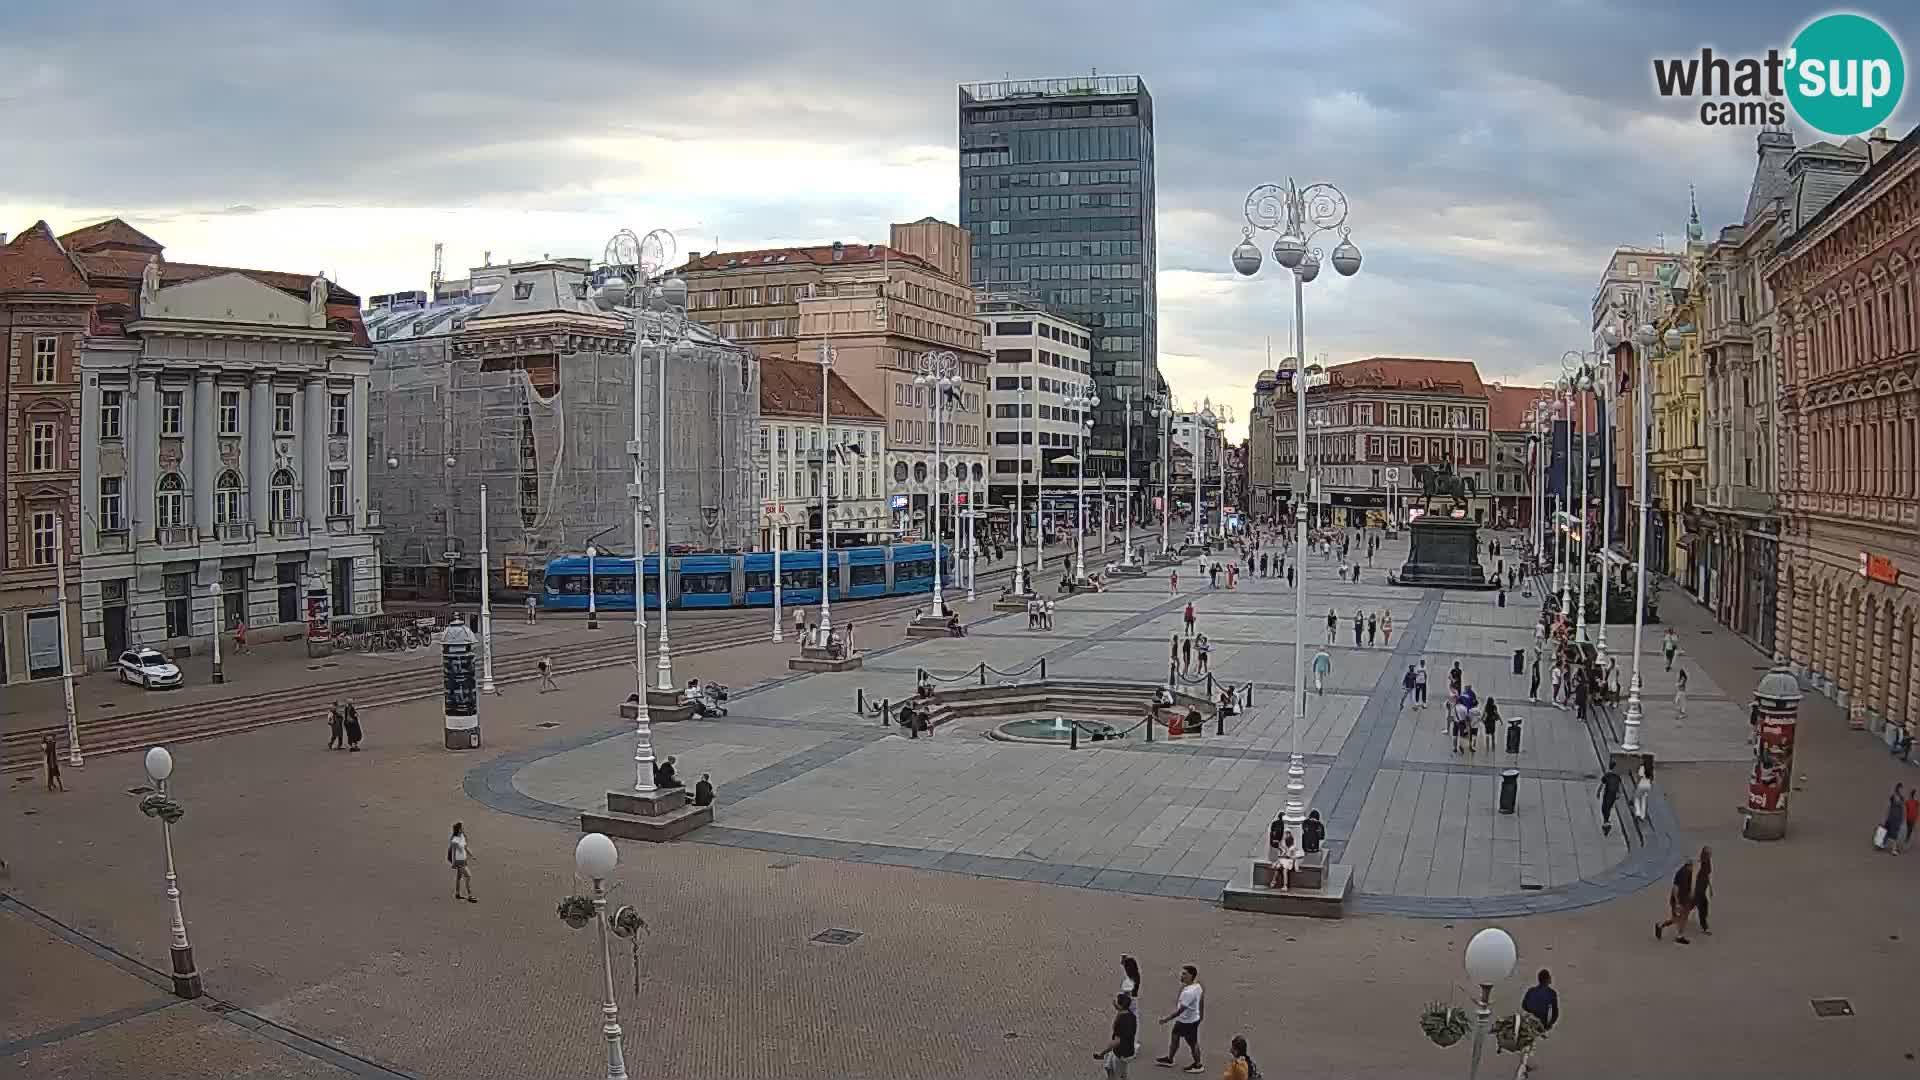 Zagreb Mon. 19:36